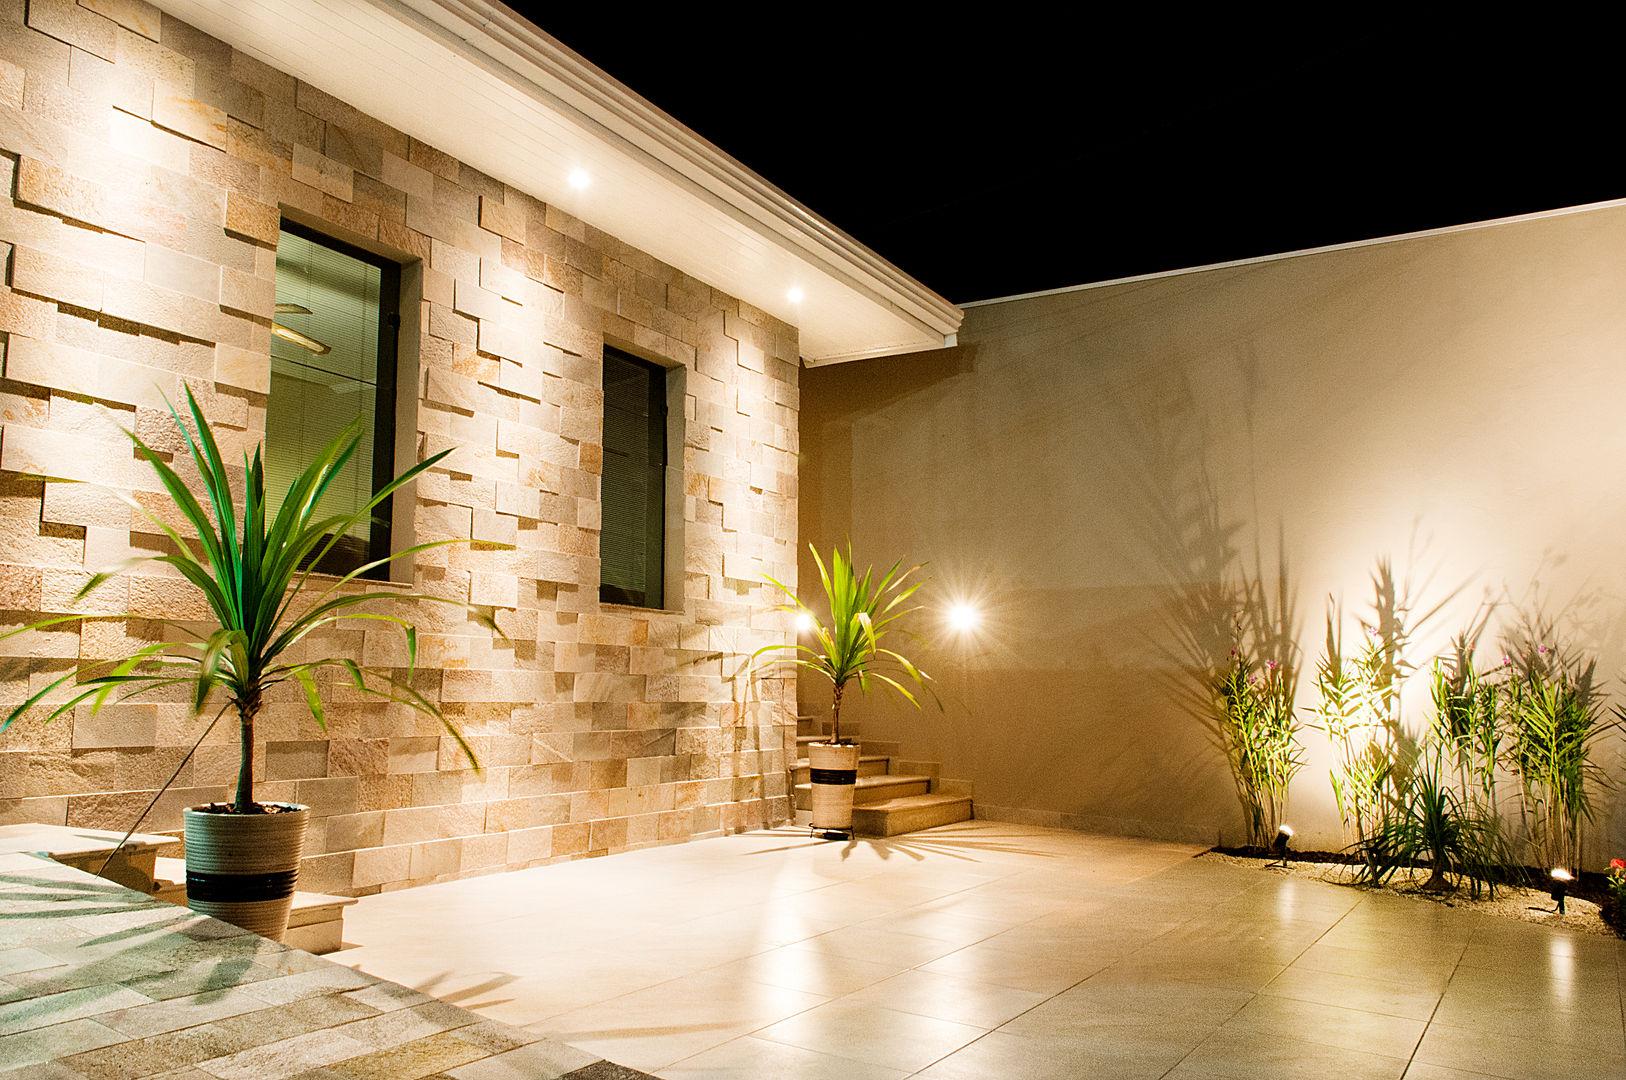 10 materiales para tener una fachada fabulosa